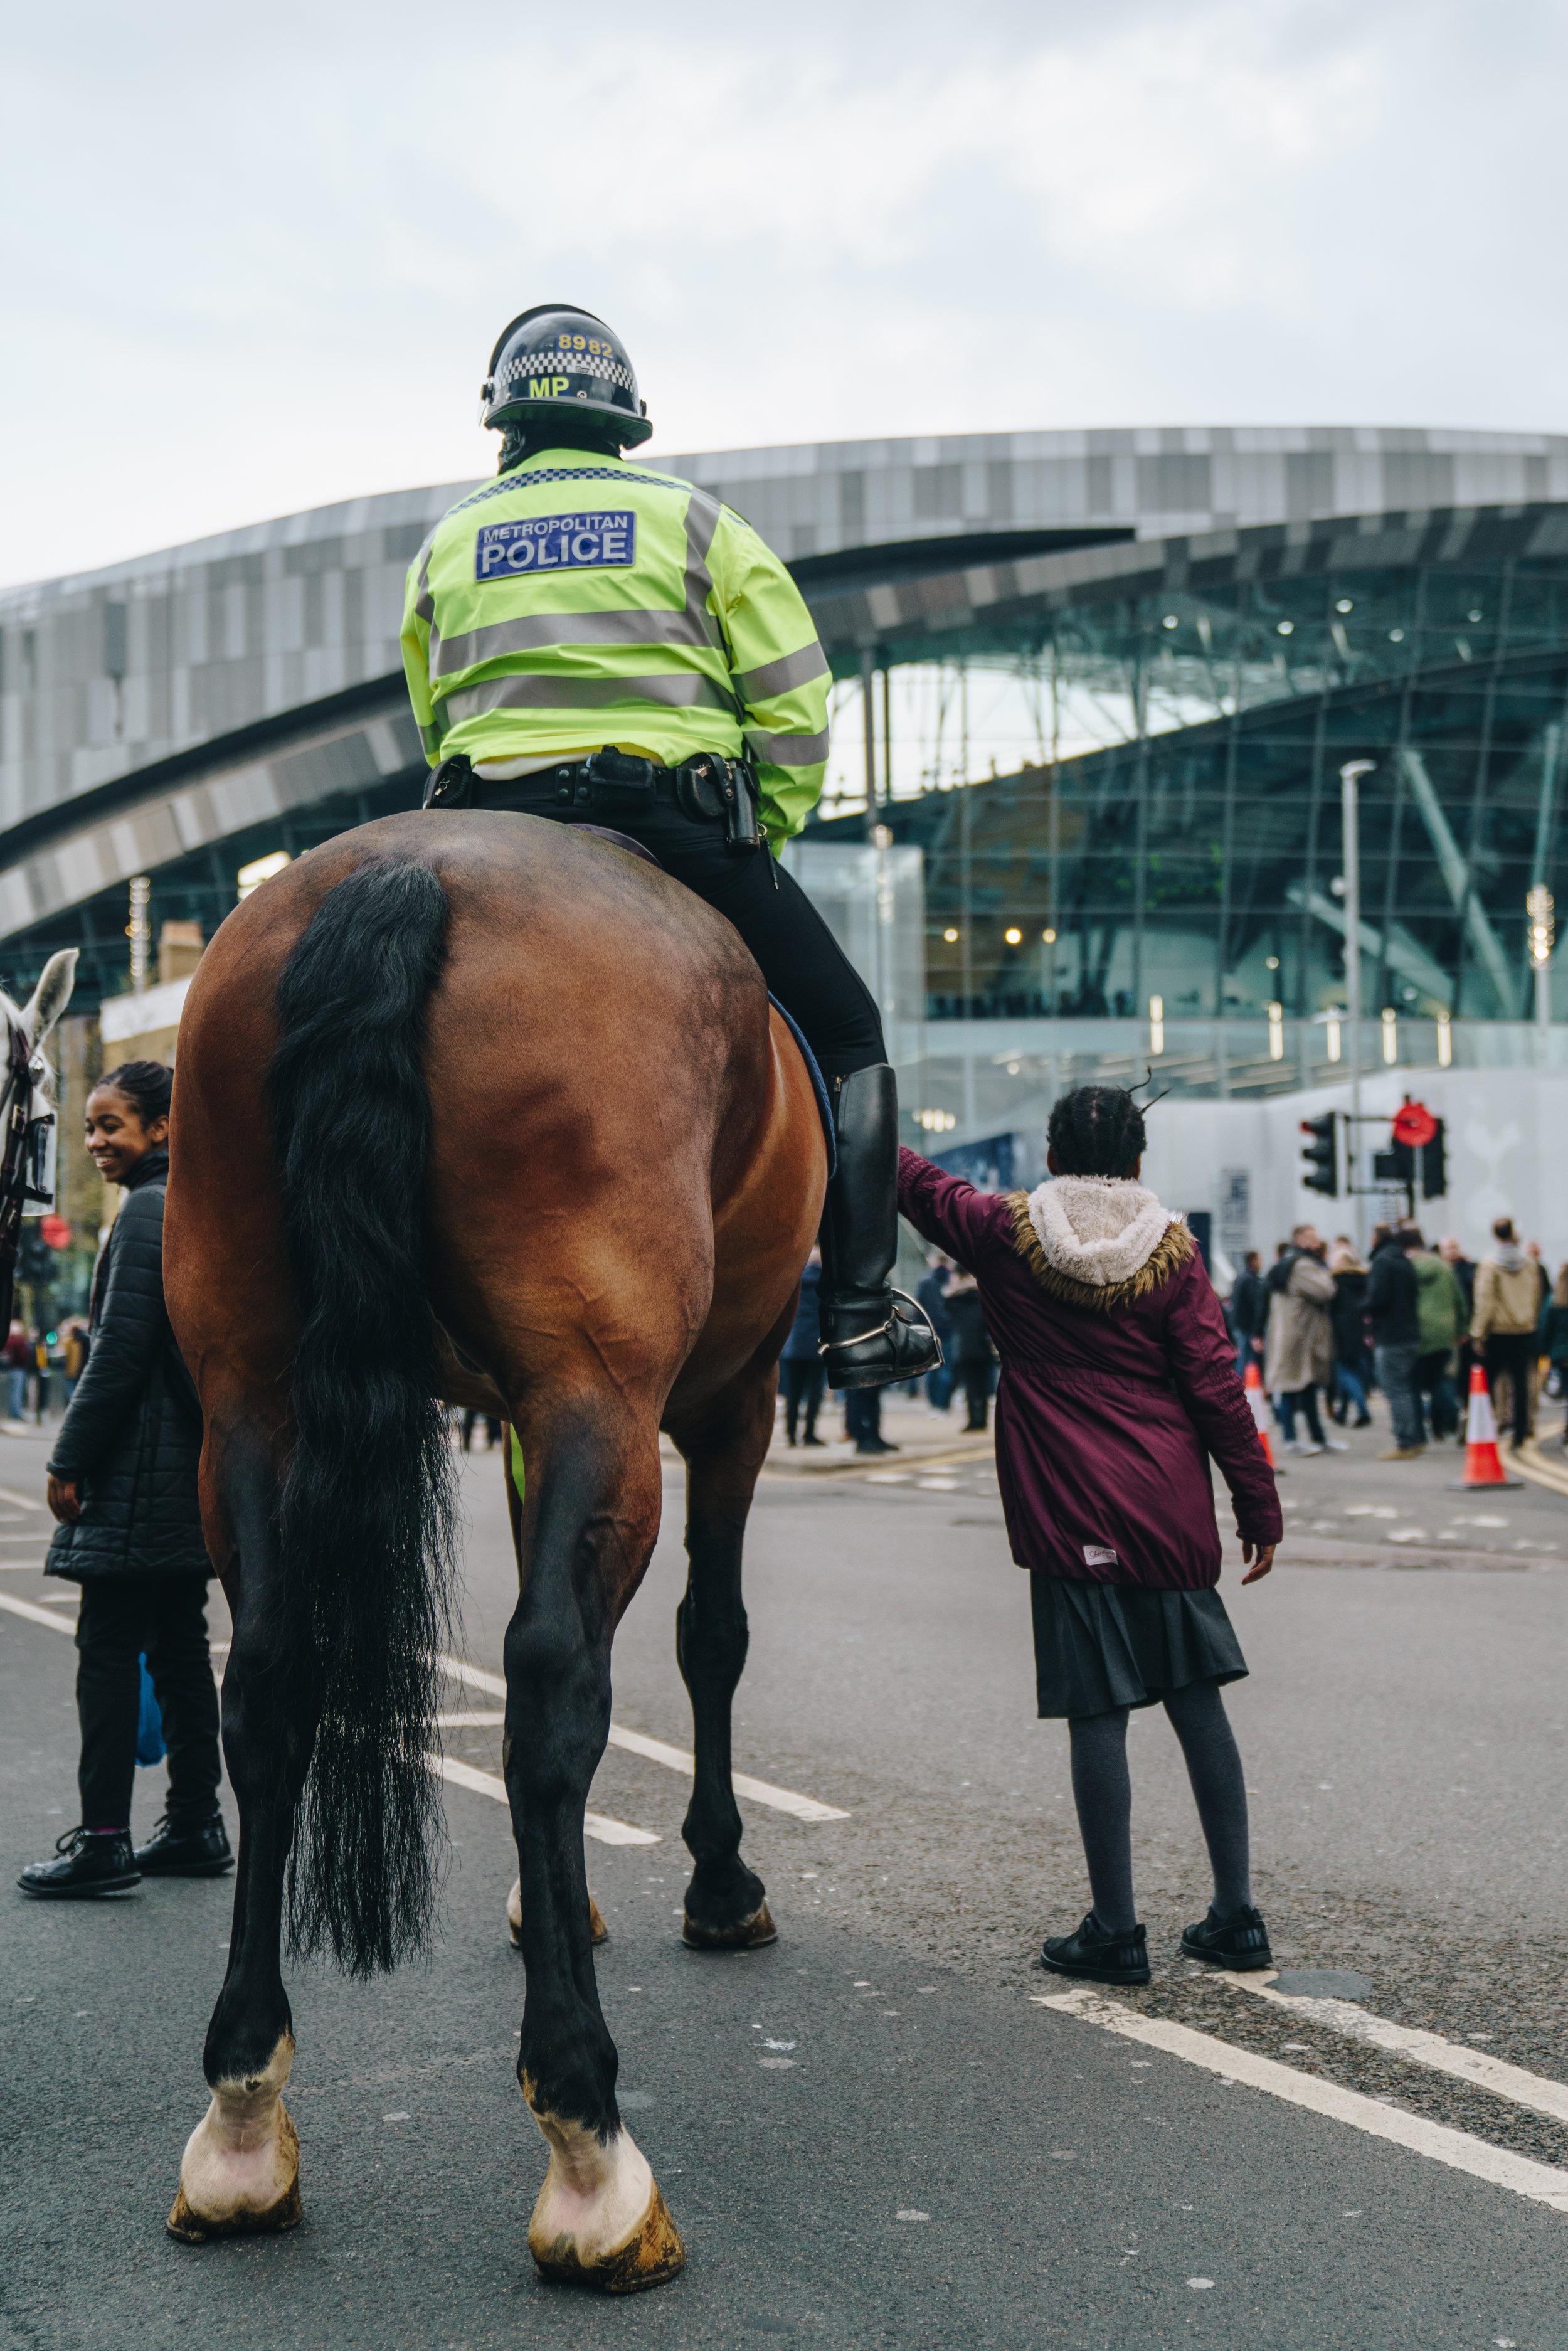 Tottenham_Quick_Edits_-14.JPG